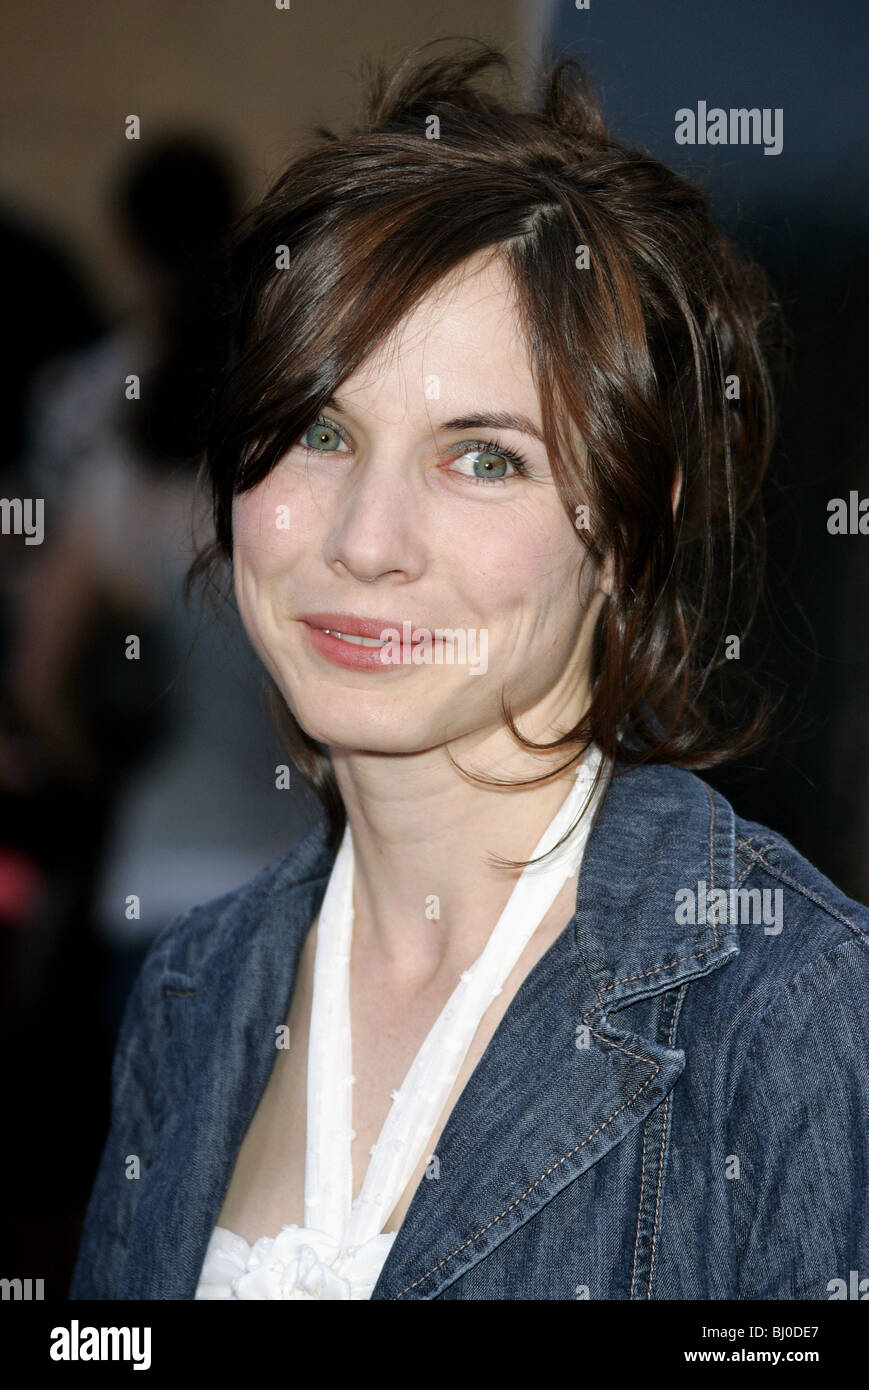 TANYA ALLEN ACTRESS HOLLYWOOD  LOS ANGELES  USA 20/04/2006 - Stock Image